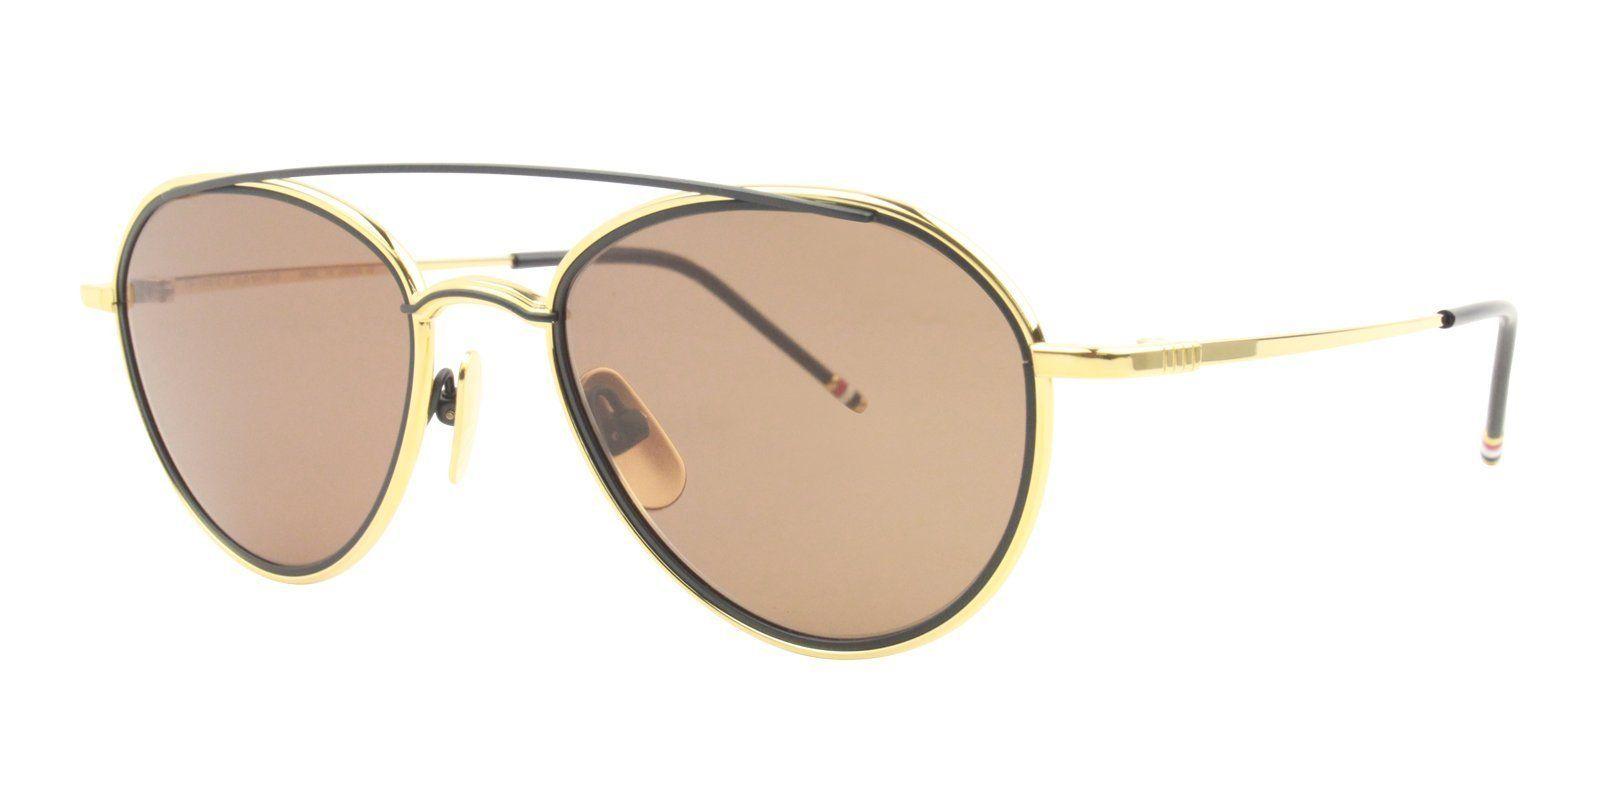 30e01cc3dc8c ... Sunglasses by DESIGNER EYES. Thom Browne - TB-109 Yellow Gold - Matte  Navy - Dark Brown - AR